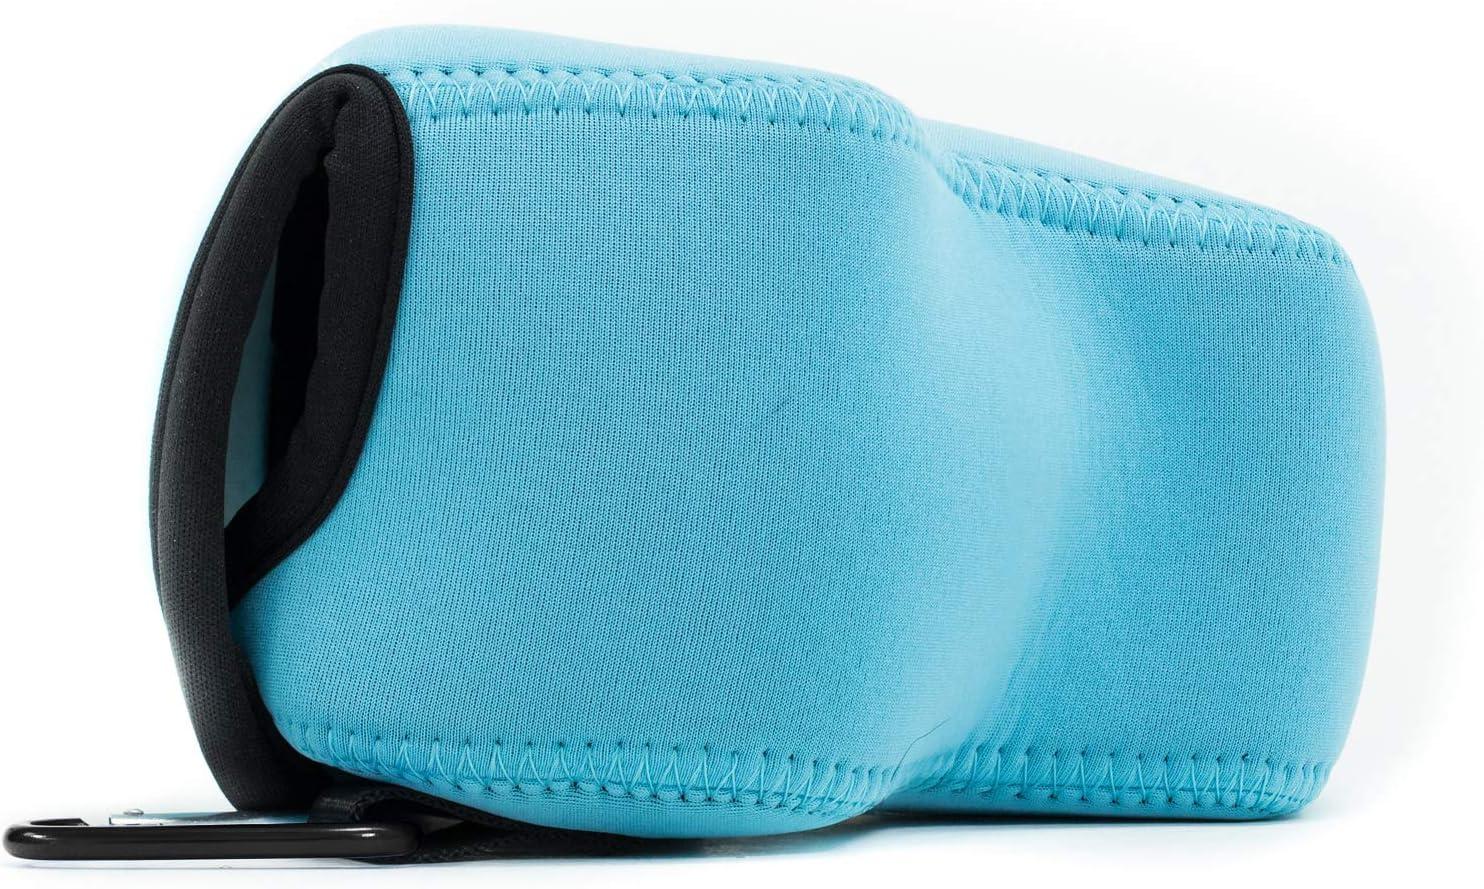 Nikon COOLPIX P610 MegaGear MG048 Ultra Light Neoprene Camera Case Bag with Carabiner for Nikon Camera P600